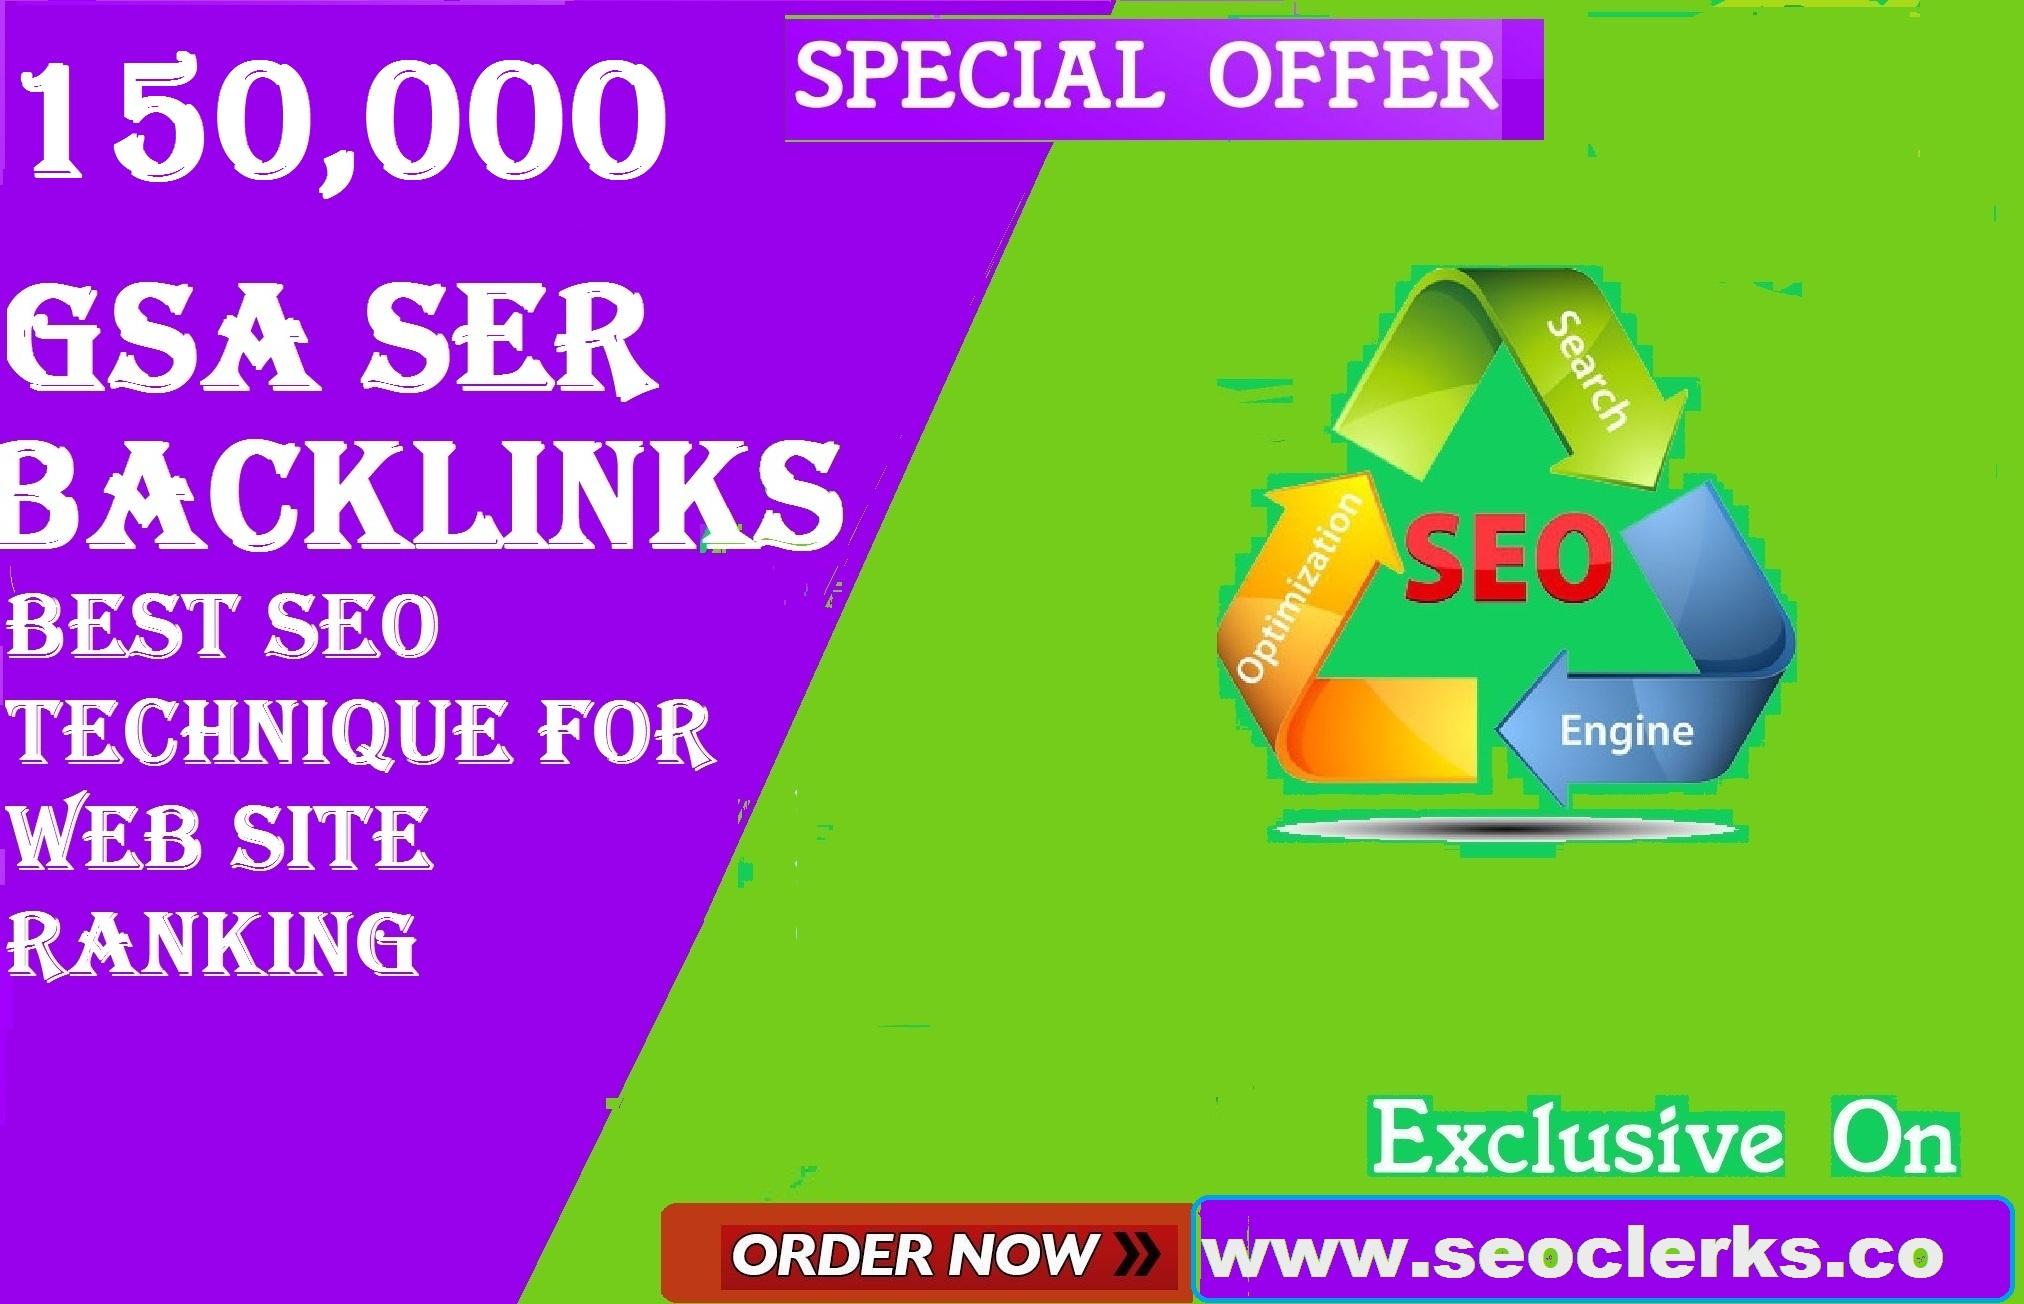 High quality seo 1000000 Gsa ser backlinks fast rangking